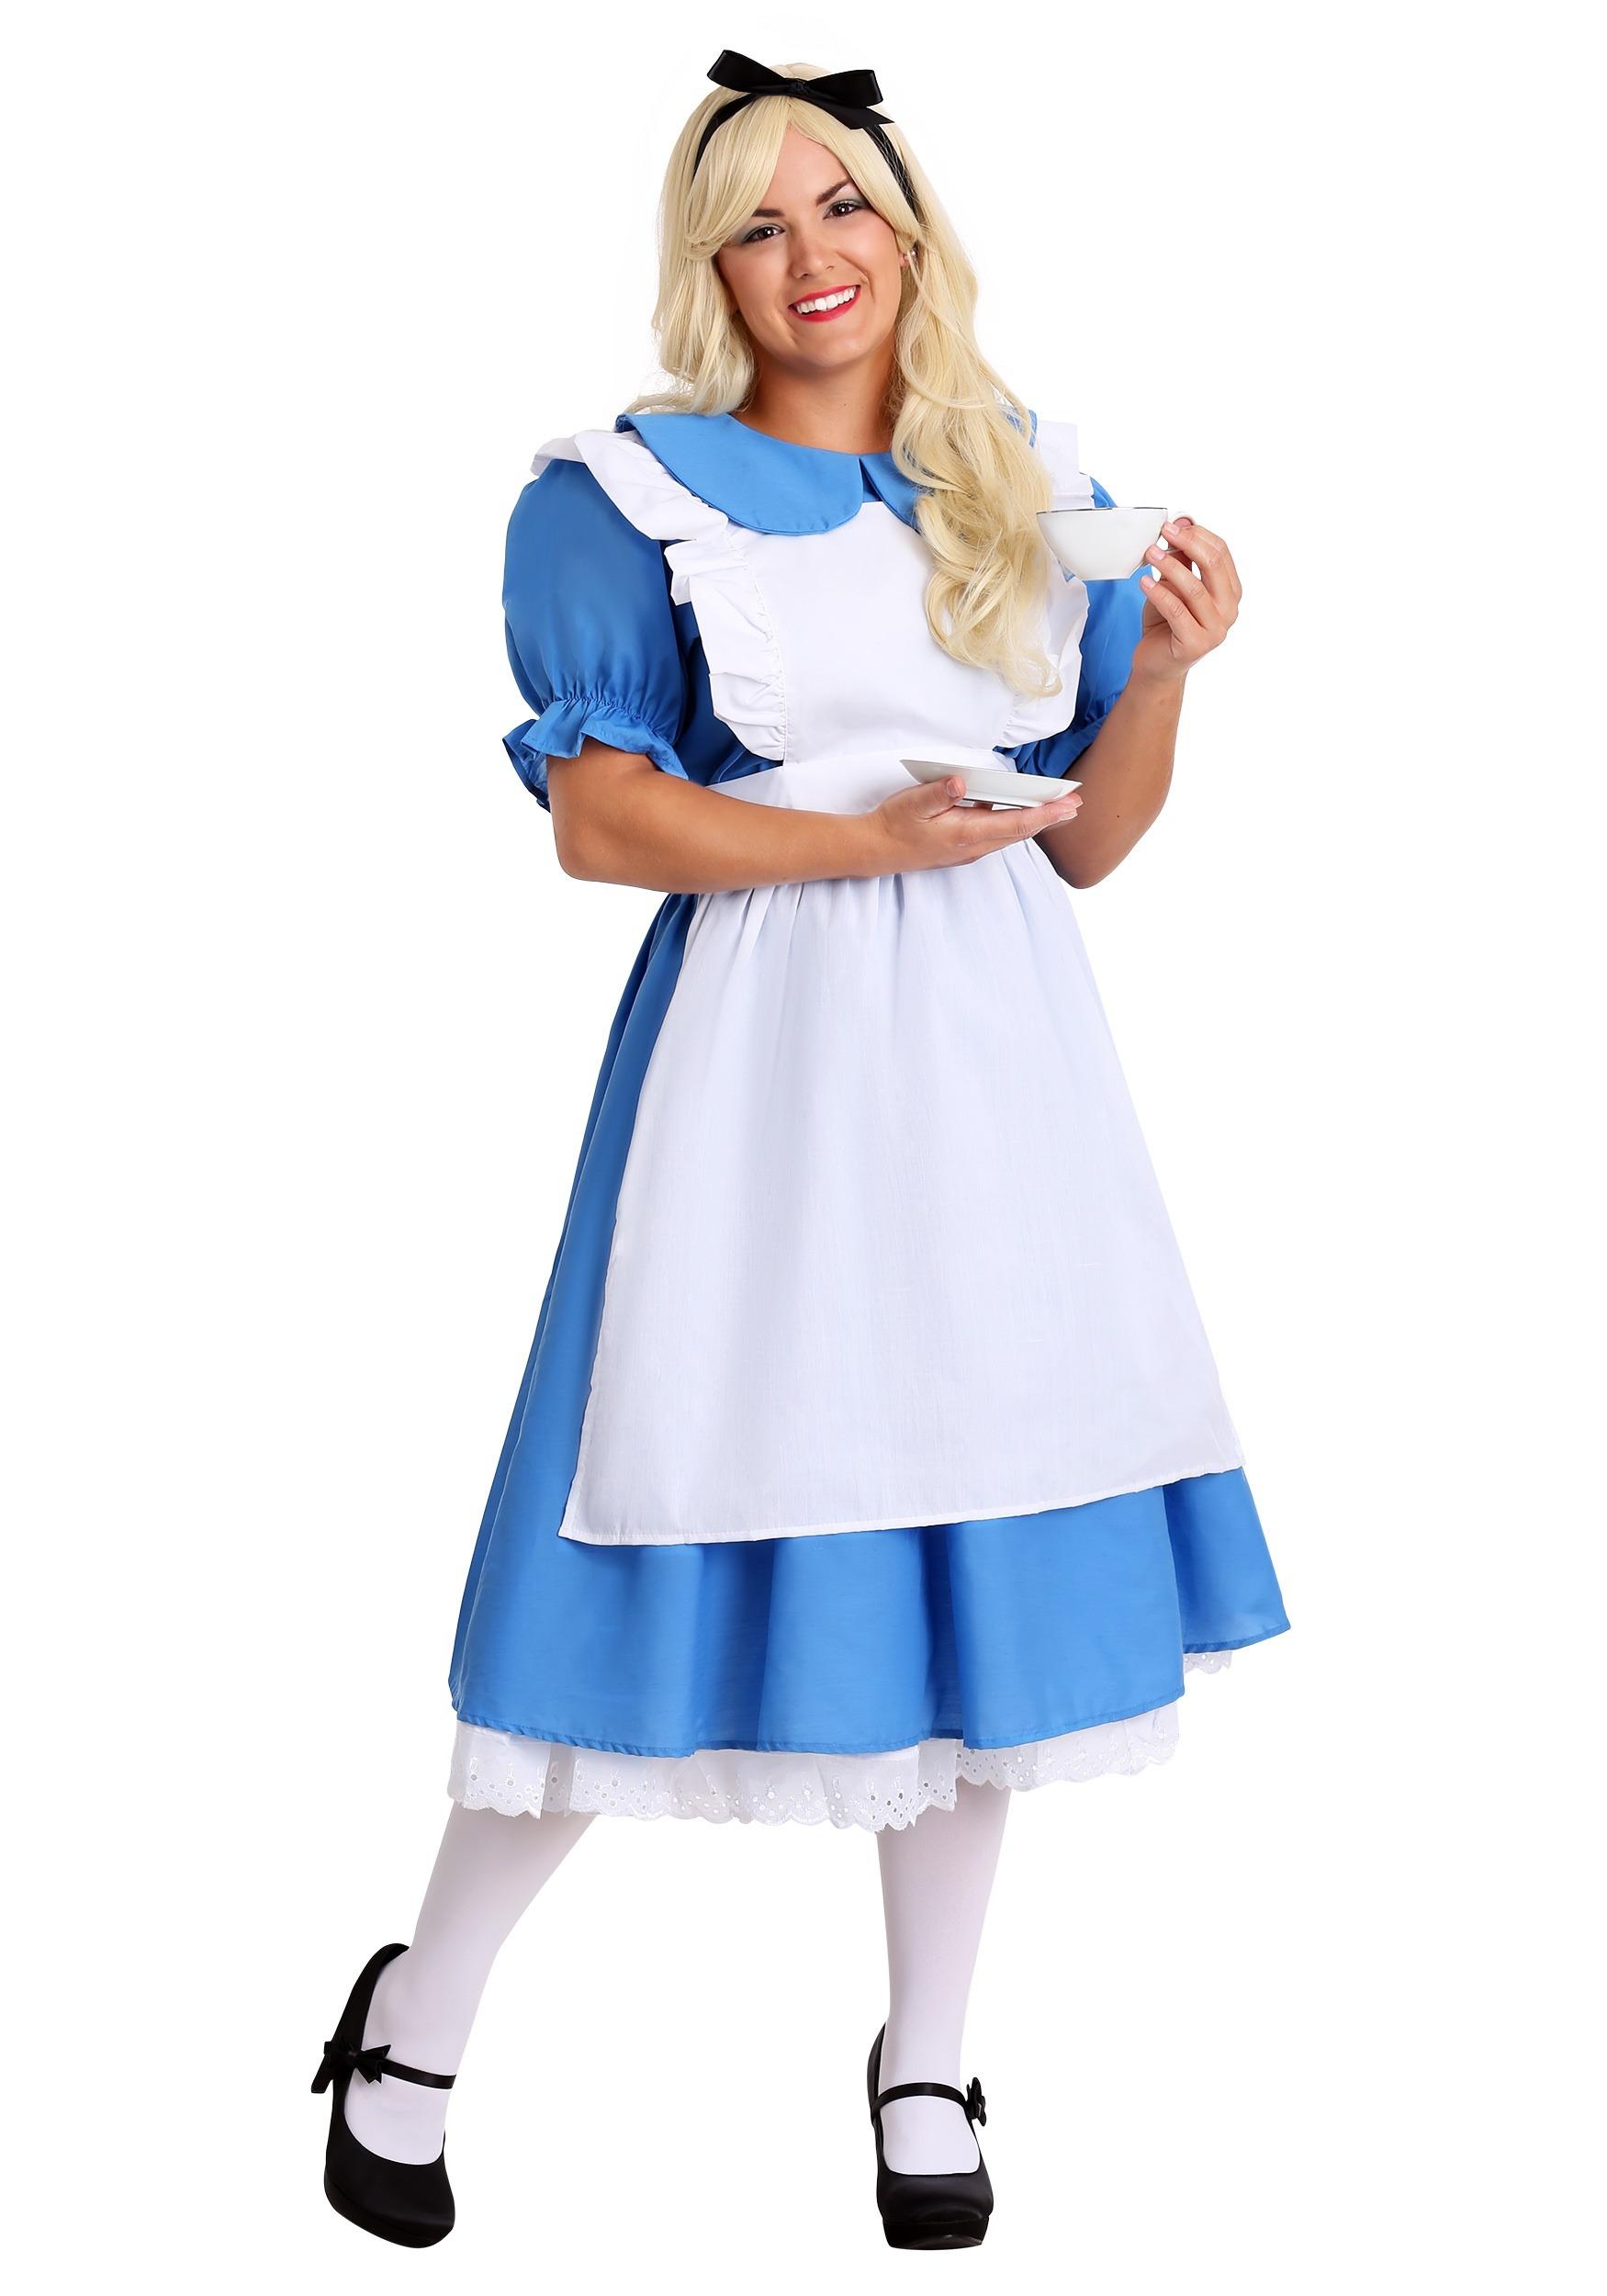 plus size dorothy halloween costume ✓ halloween